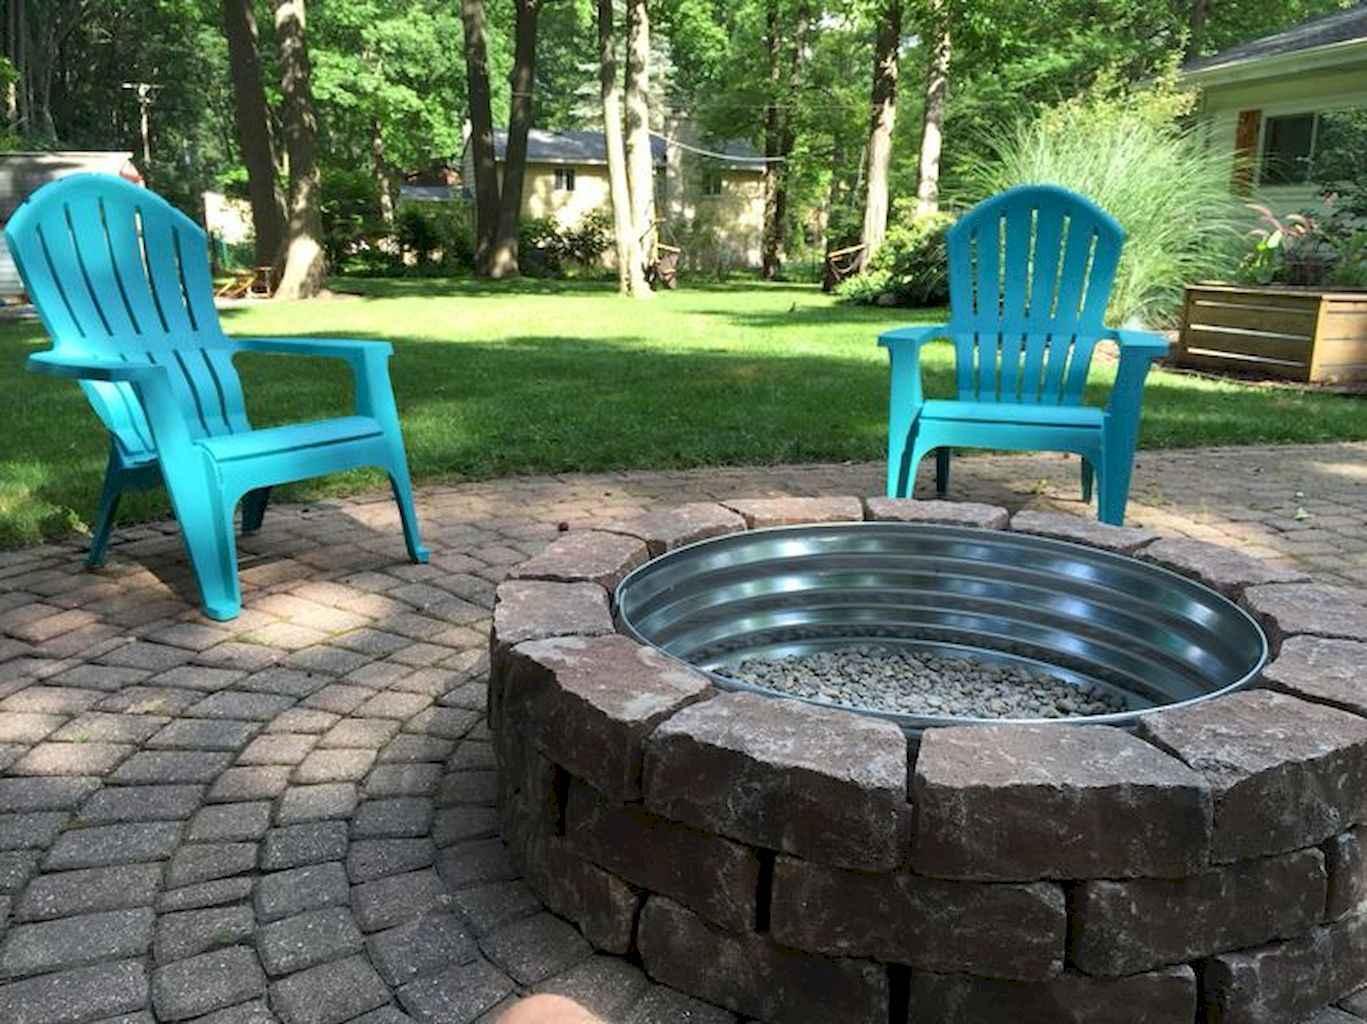 60 Beautiful Backyard Fire Pit Ideas Decoration and Remodel (19)